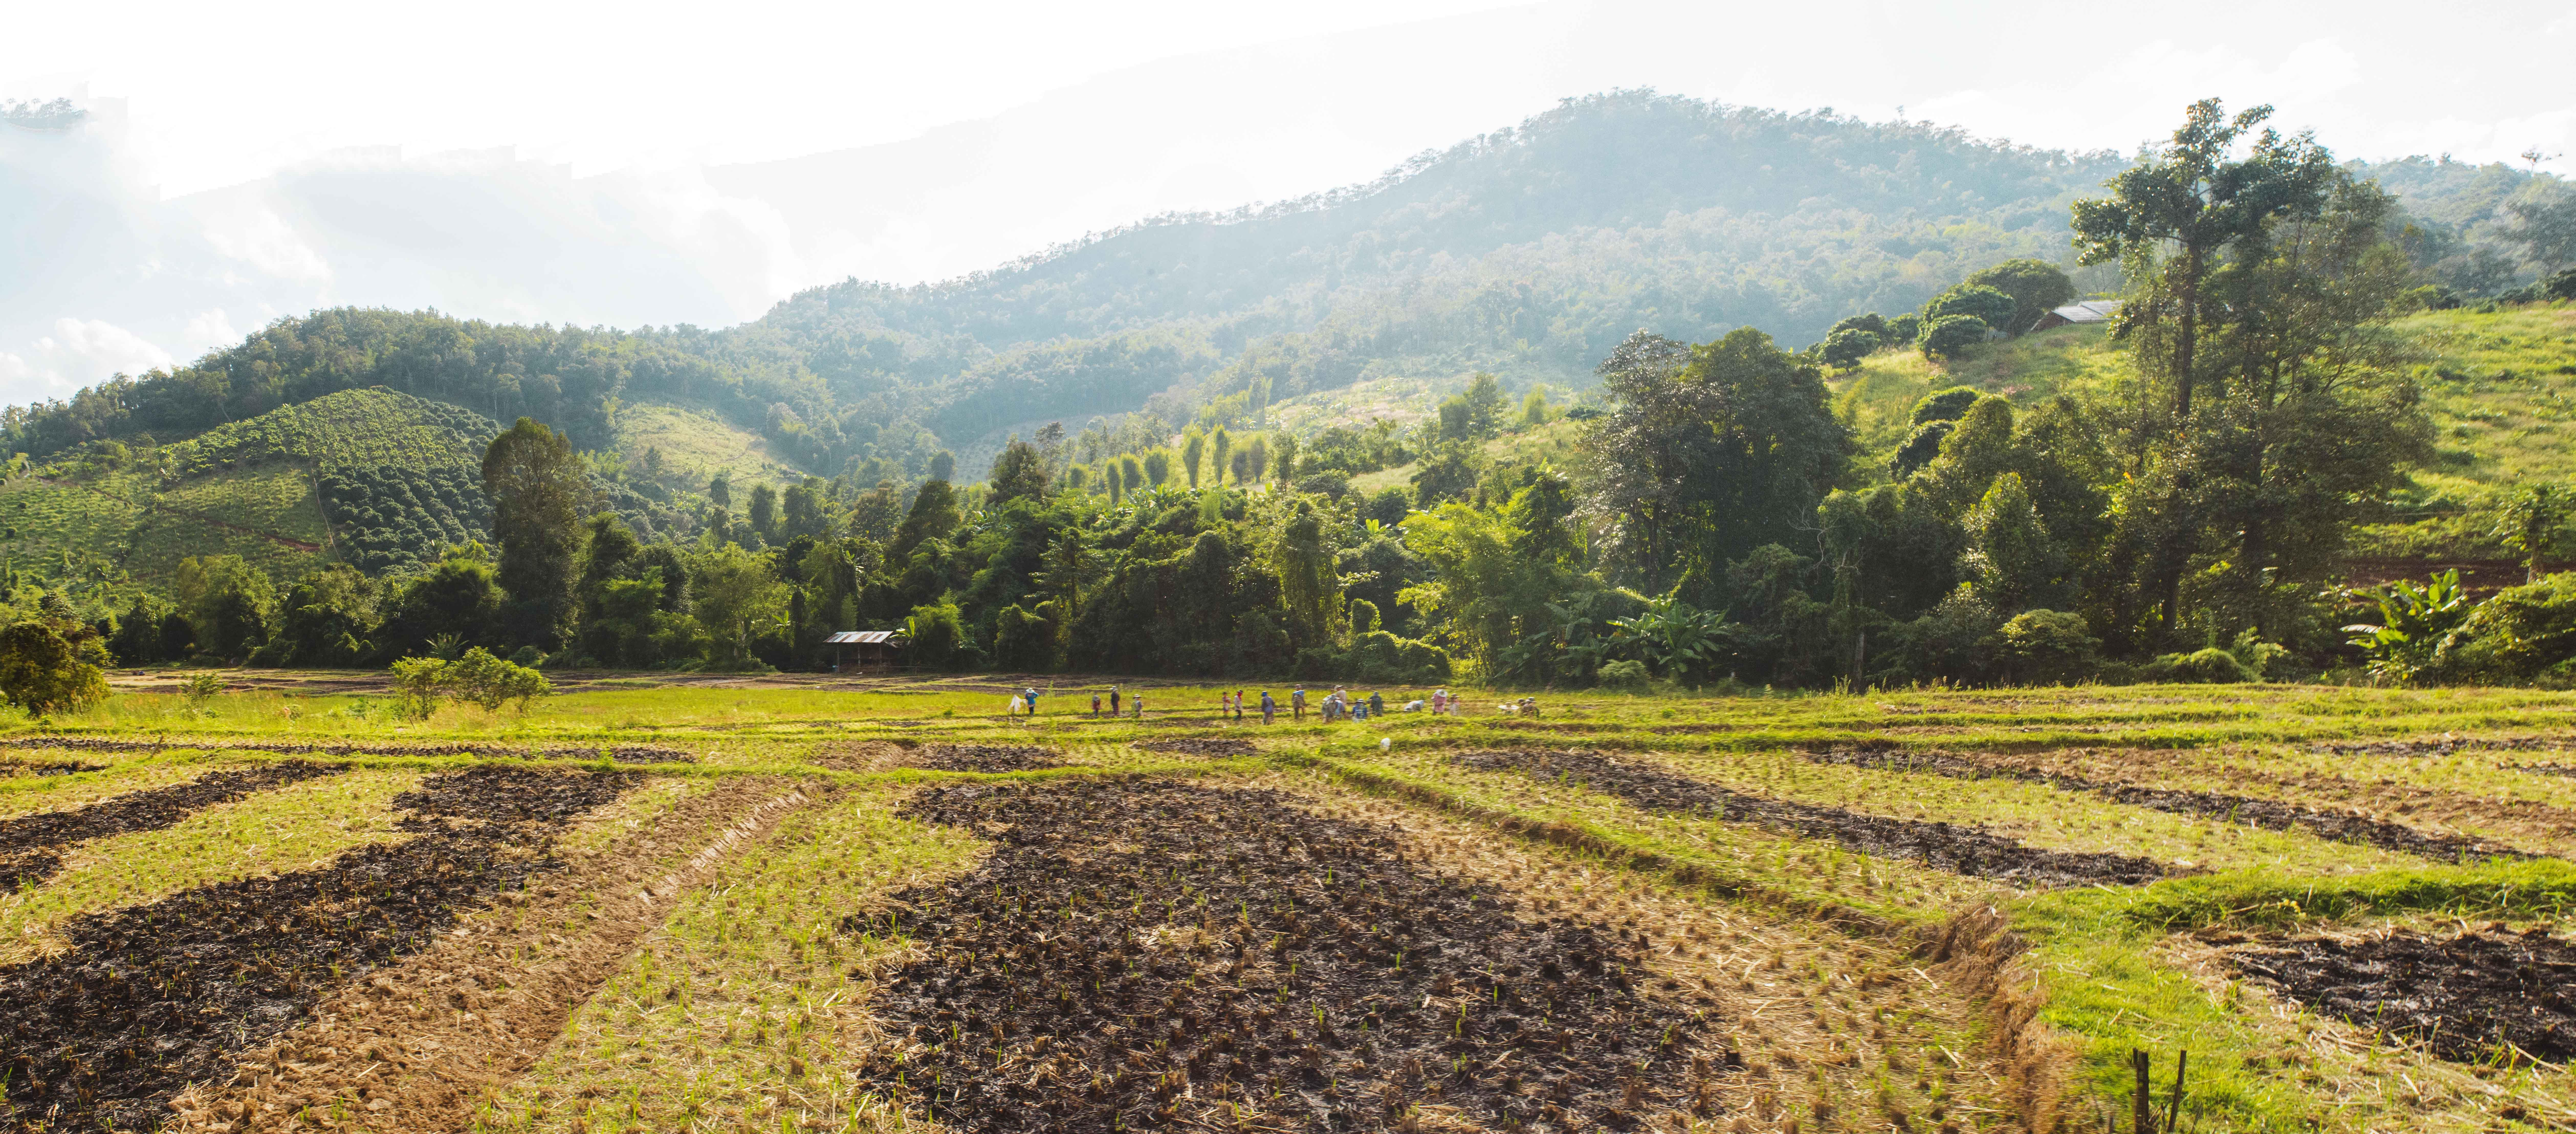 fields outside of CHiang Mai